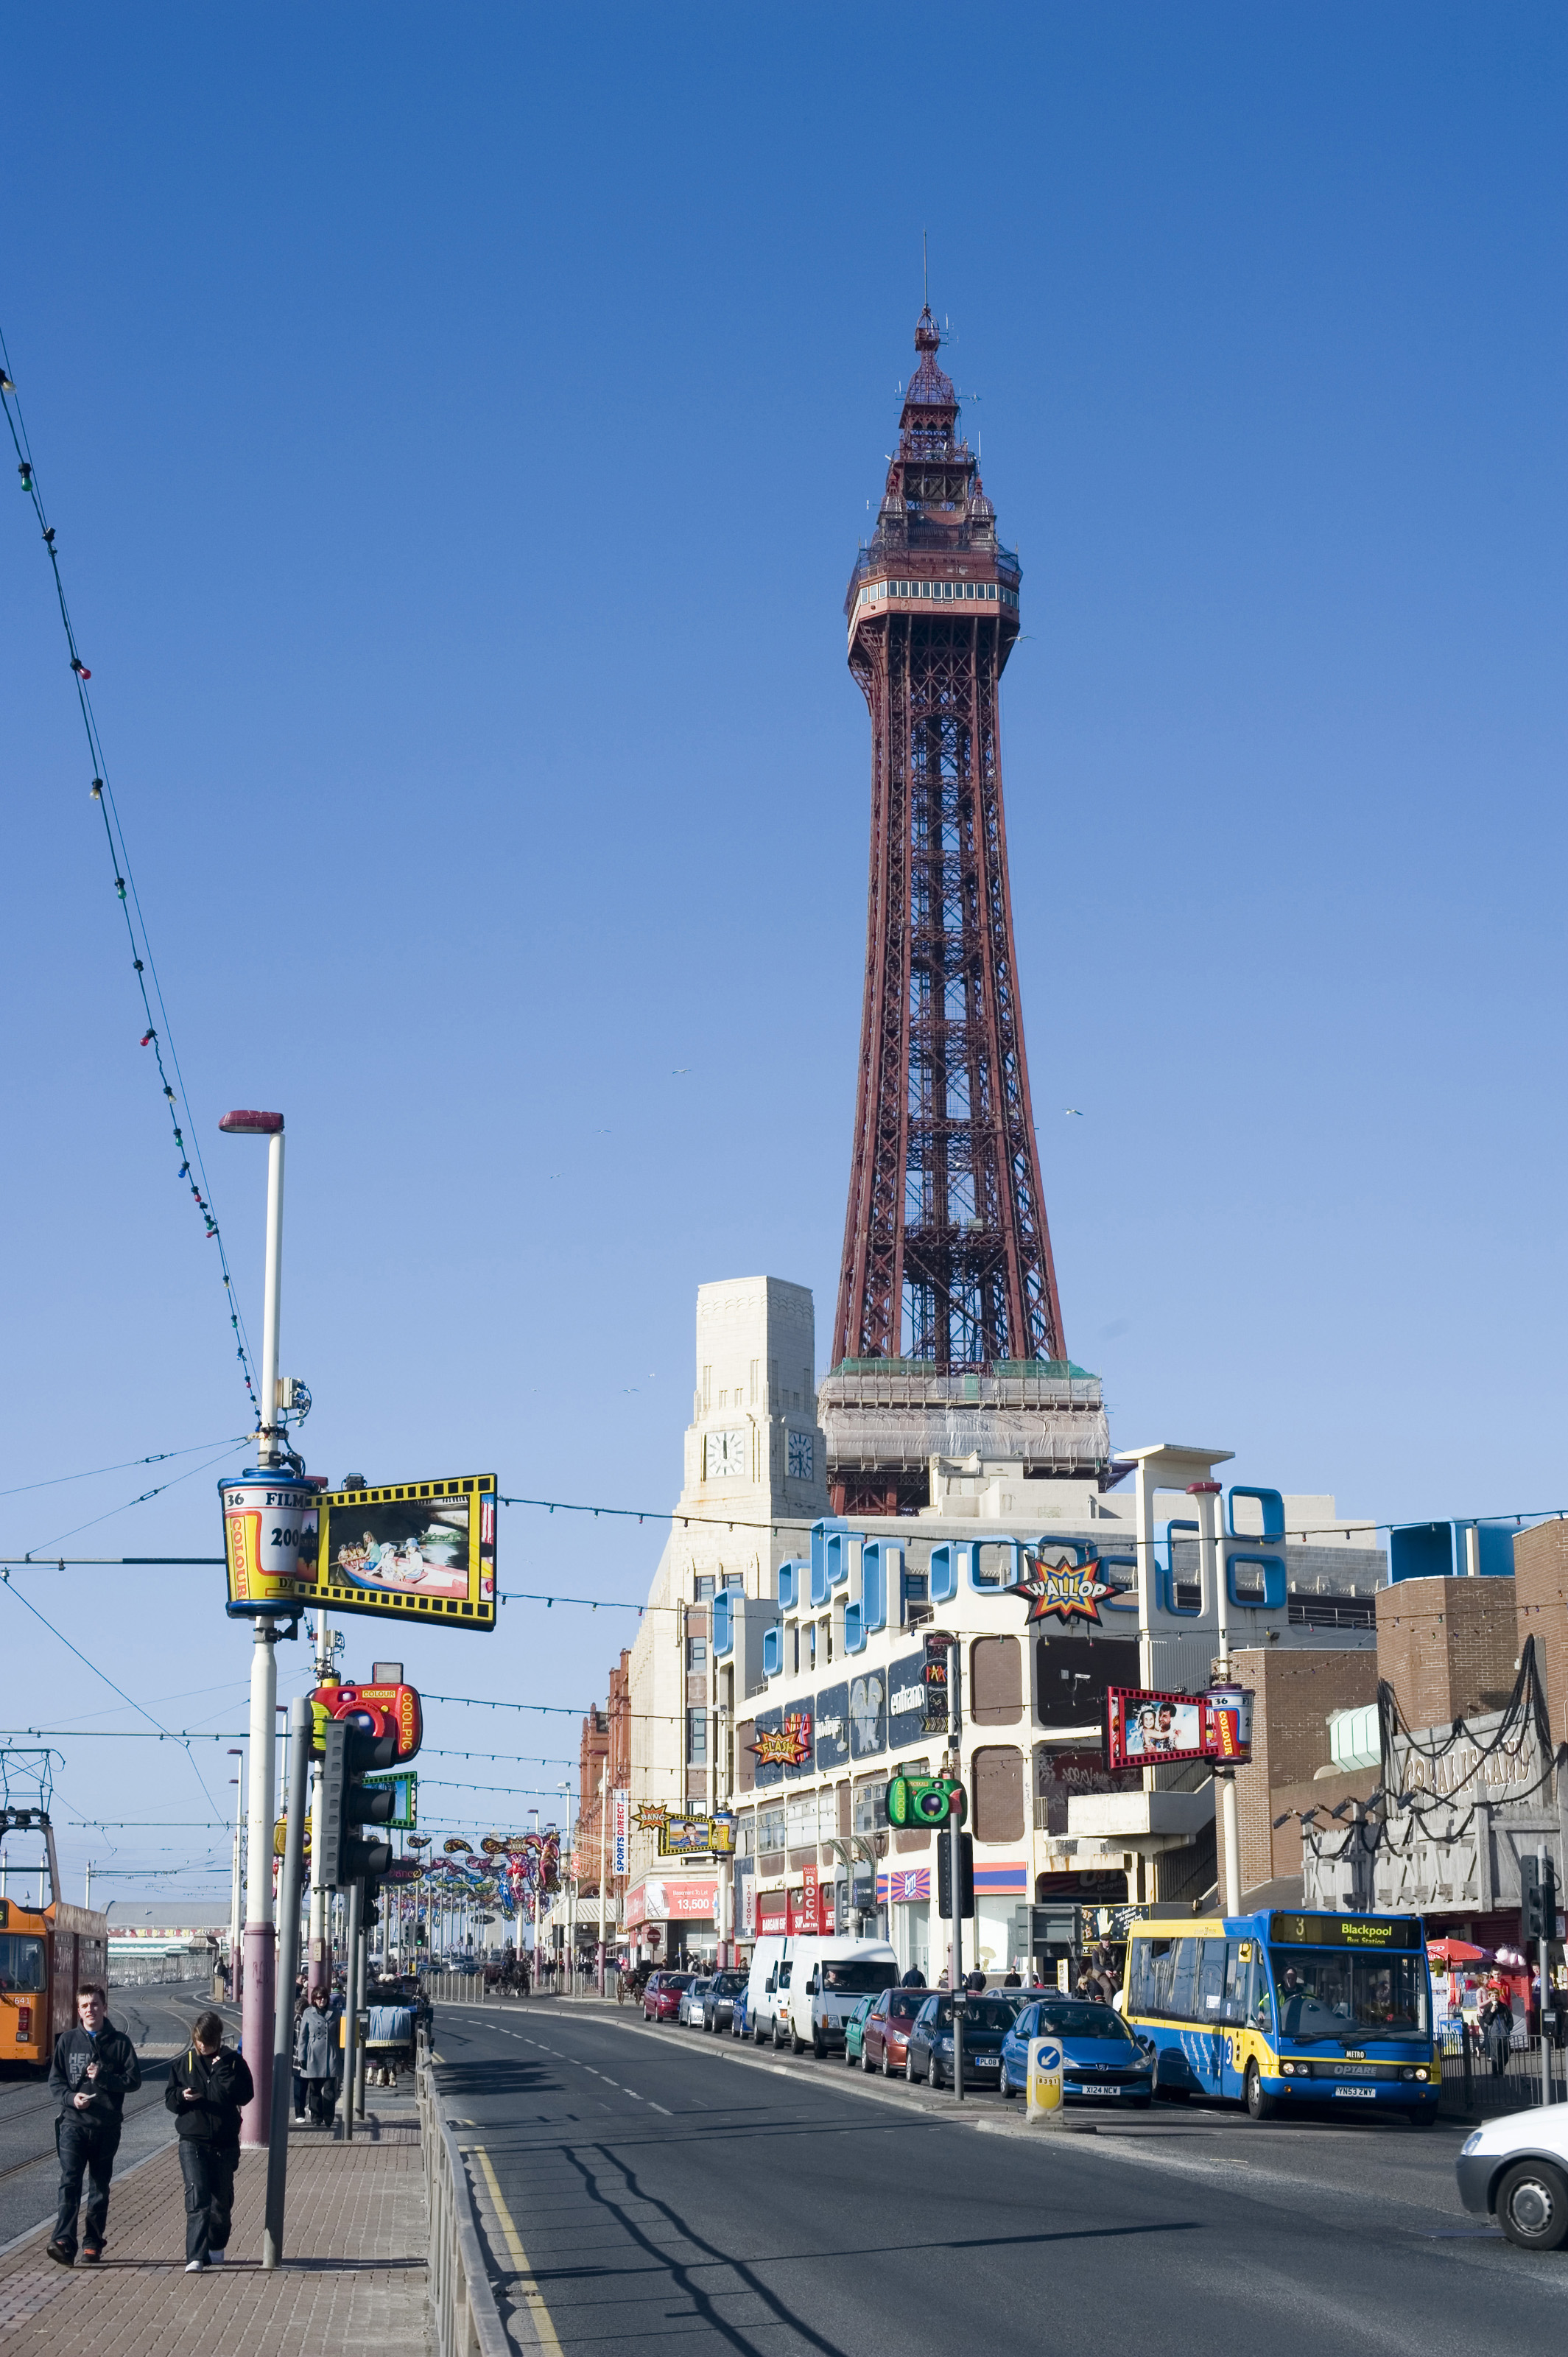 Free Stock Photo 7682 Blackpool Tower And Promenade